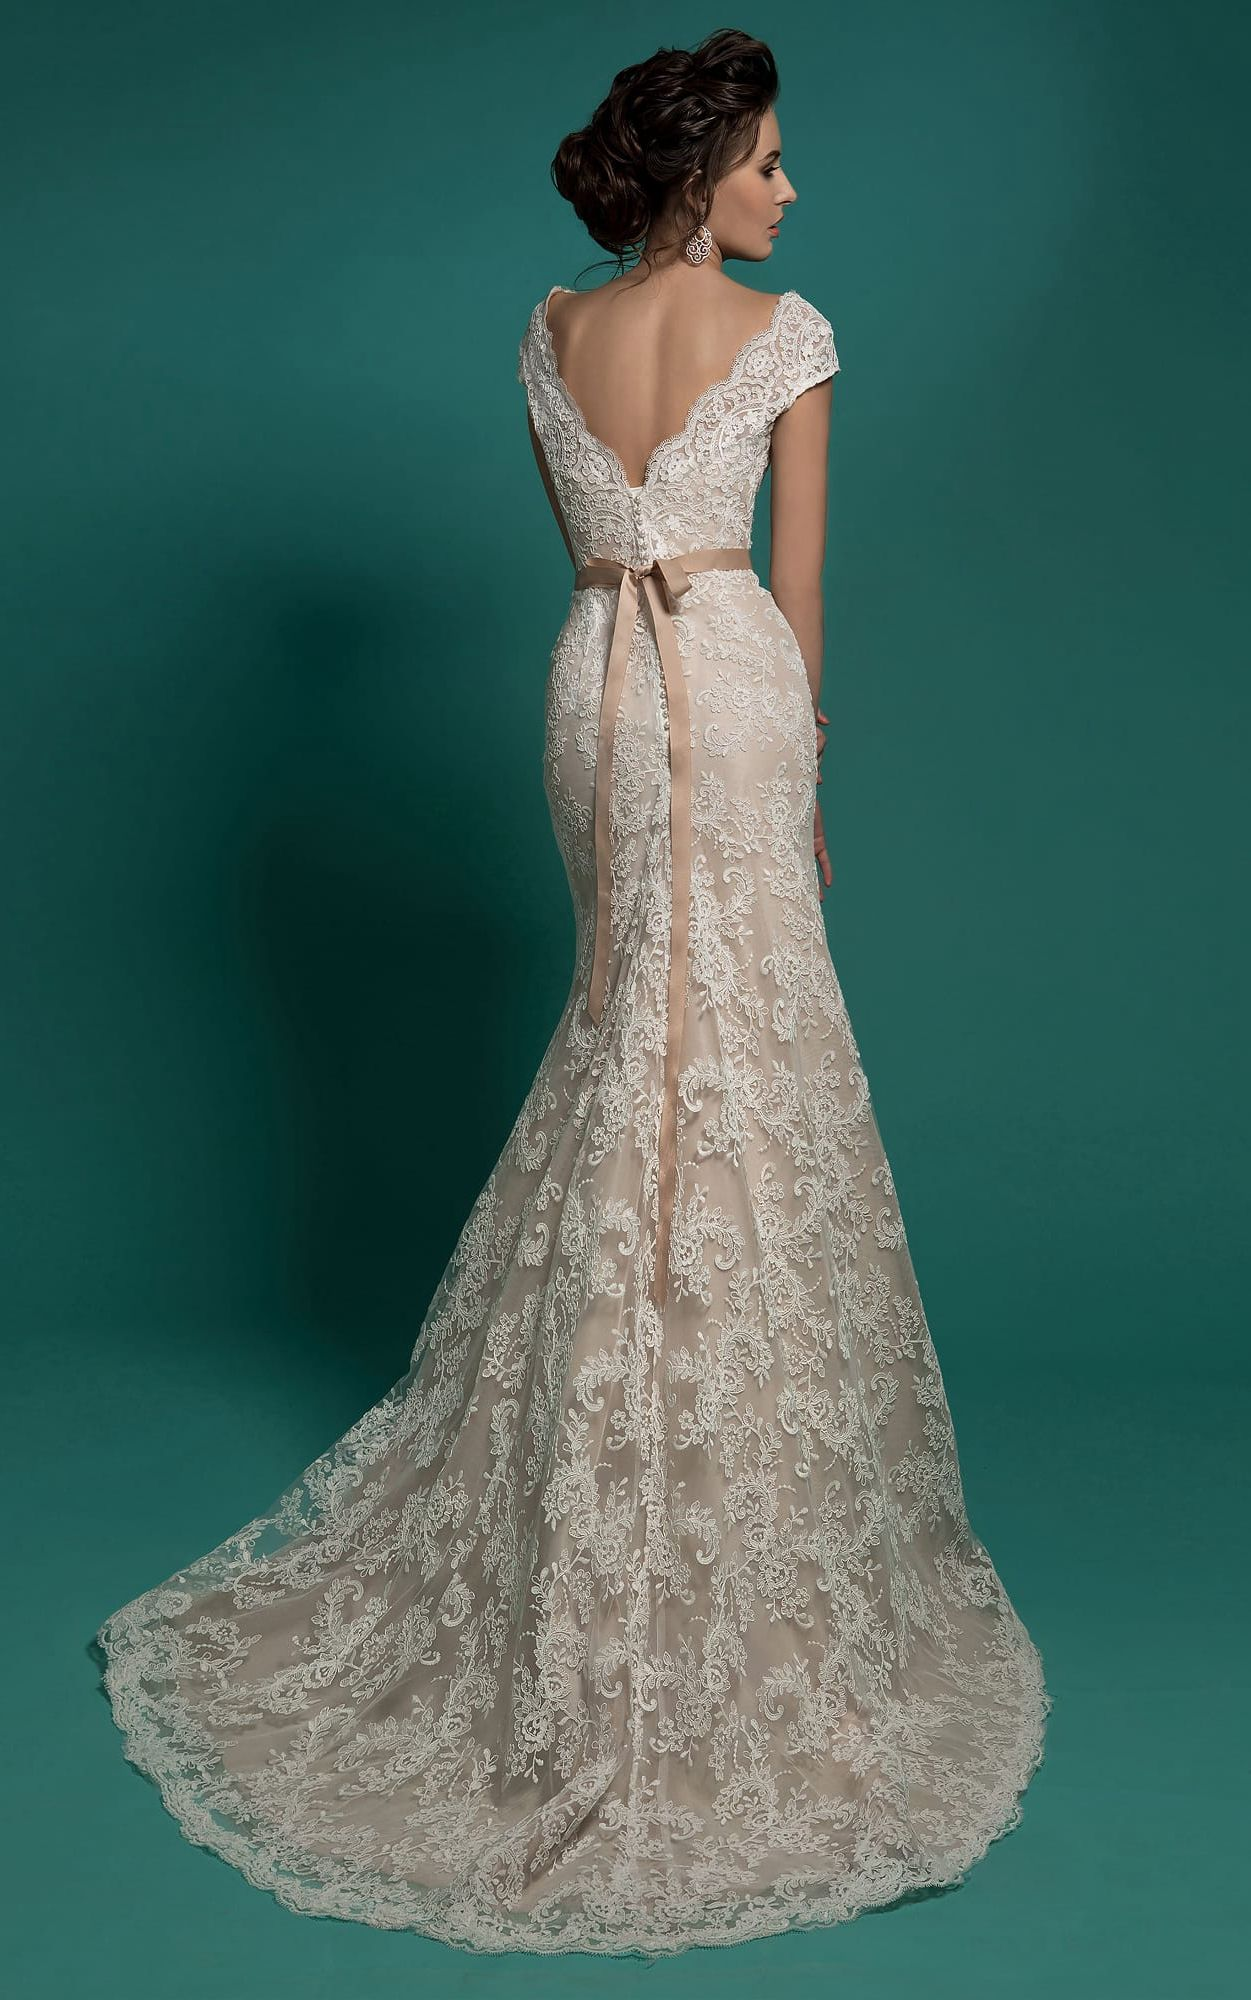 US176.89 Cap Sleeve VBack Sheath Wedding Dress with